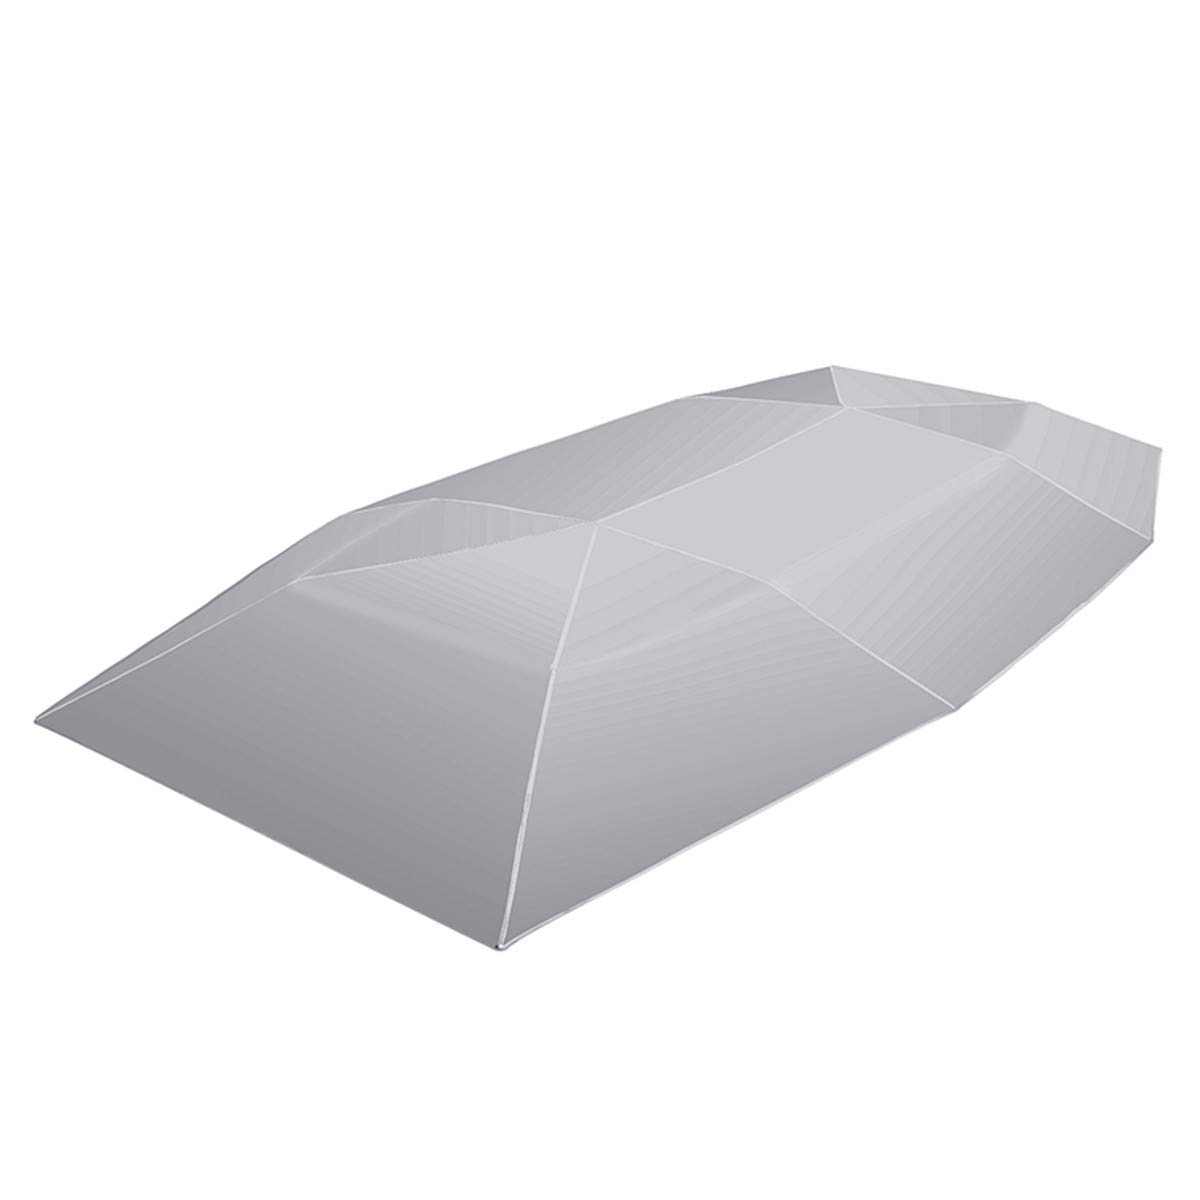 Jiaboyu Car Umbrella Sun Shade Cover Tent Cloth Universal UV Protect-Protection Car Umbrella Sunproof Sun Shade Canopy Cover Universal-Oxford Cloth+Polyester Shade Cover (Silver 4X2.1M) by Jiaboyu